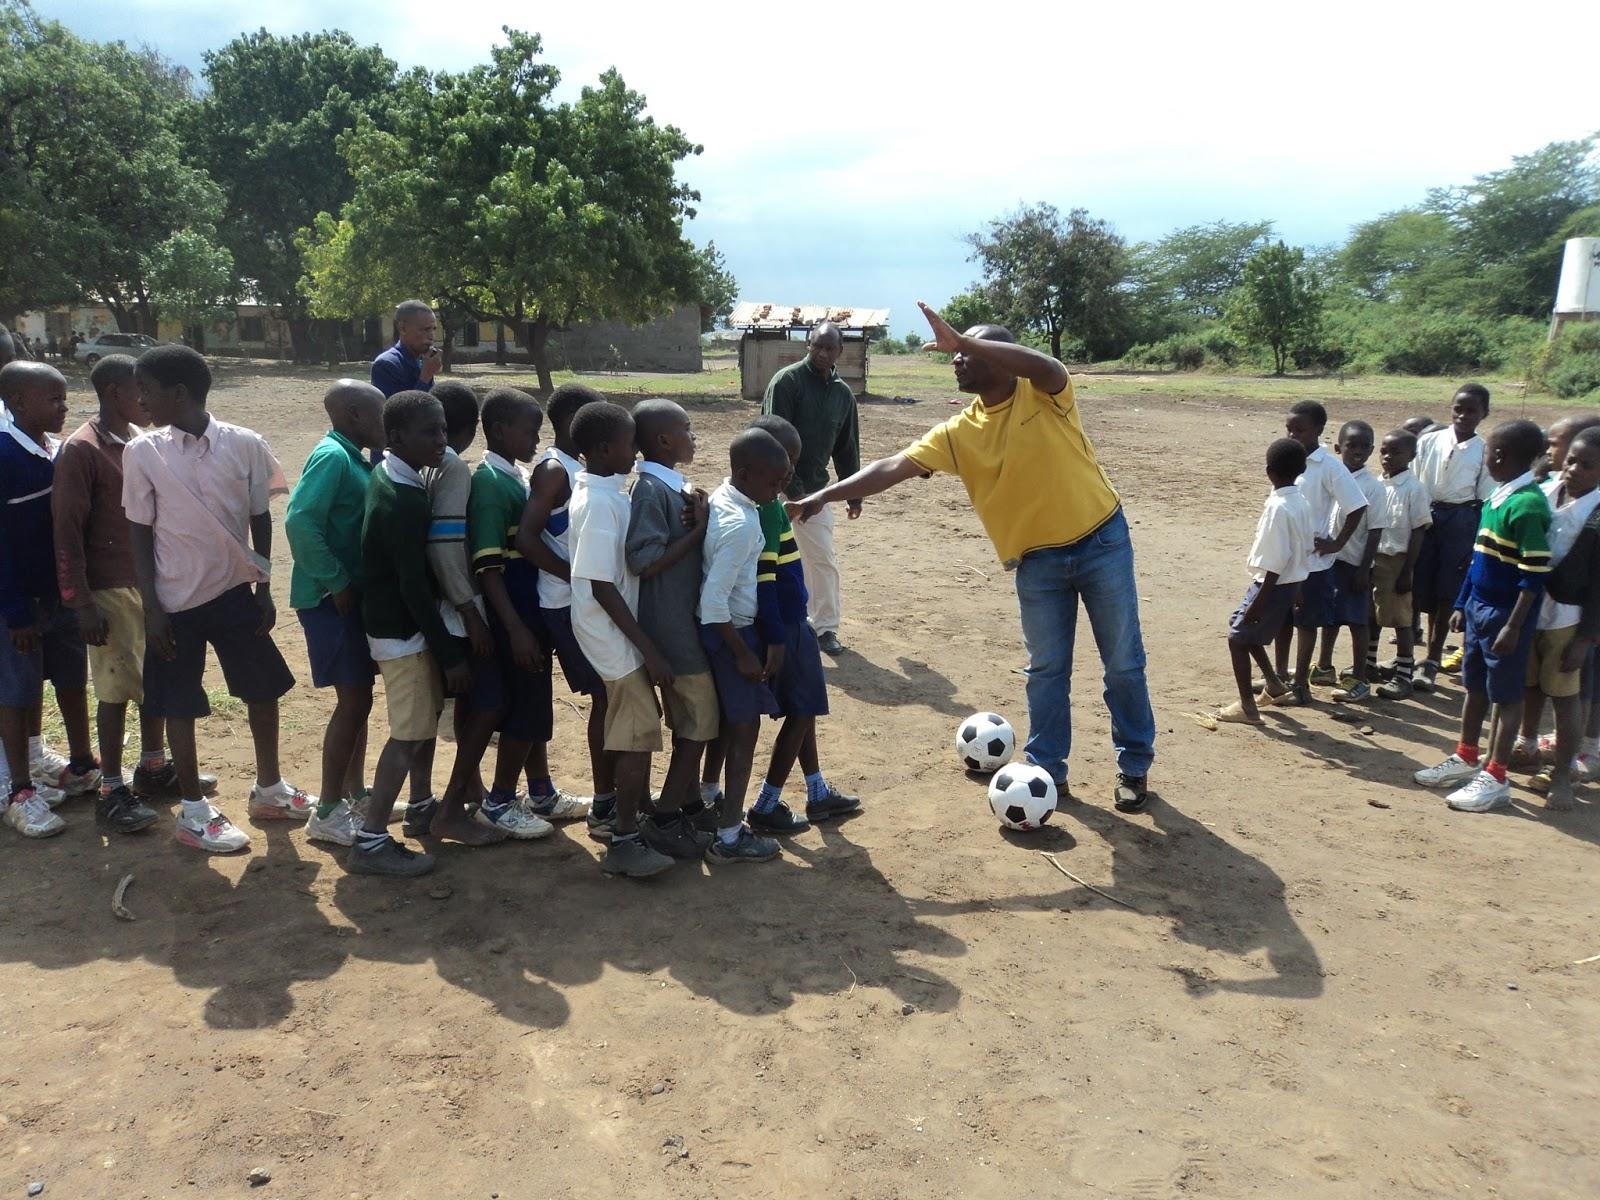 Elimu Mwangaza in Tanzania – against child abuse of all kind